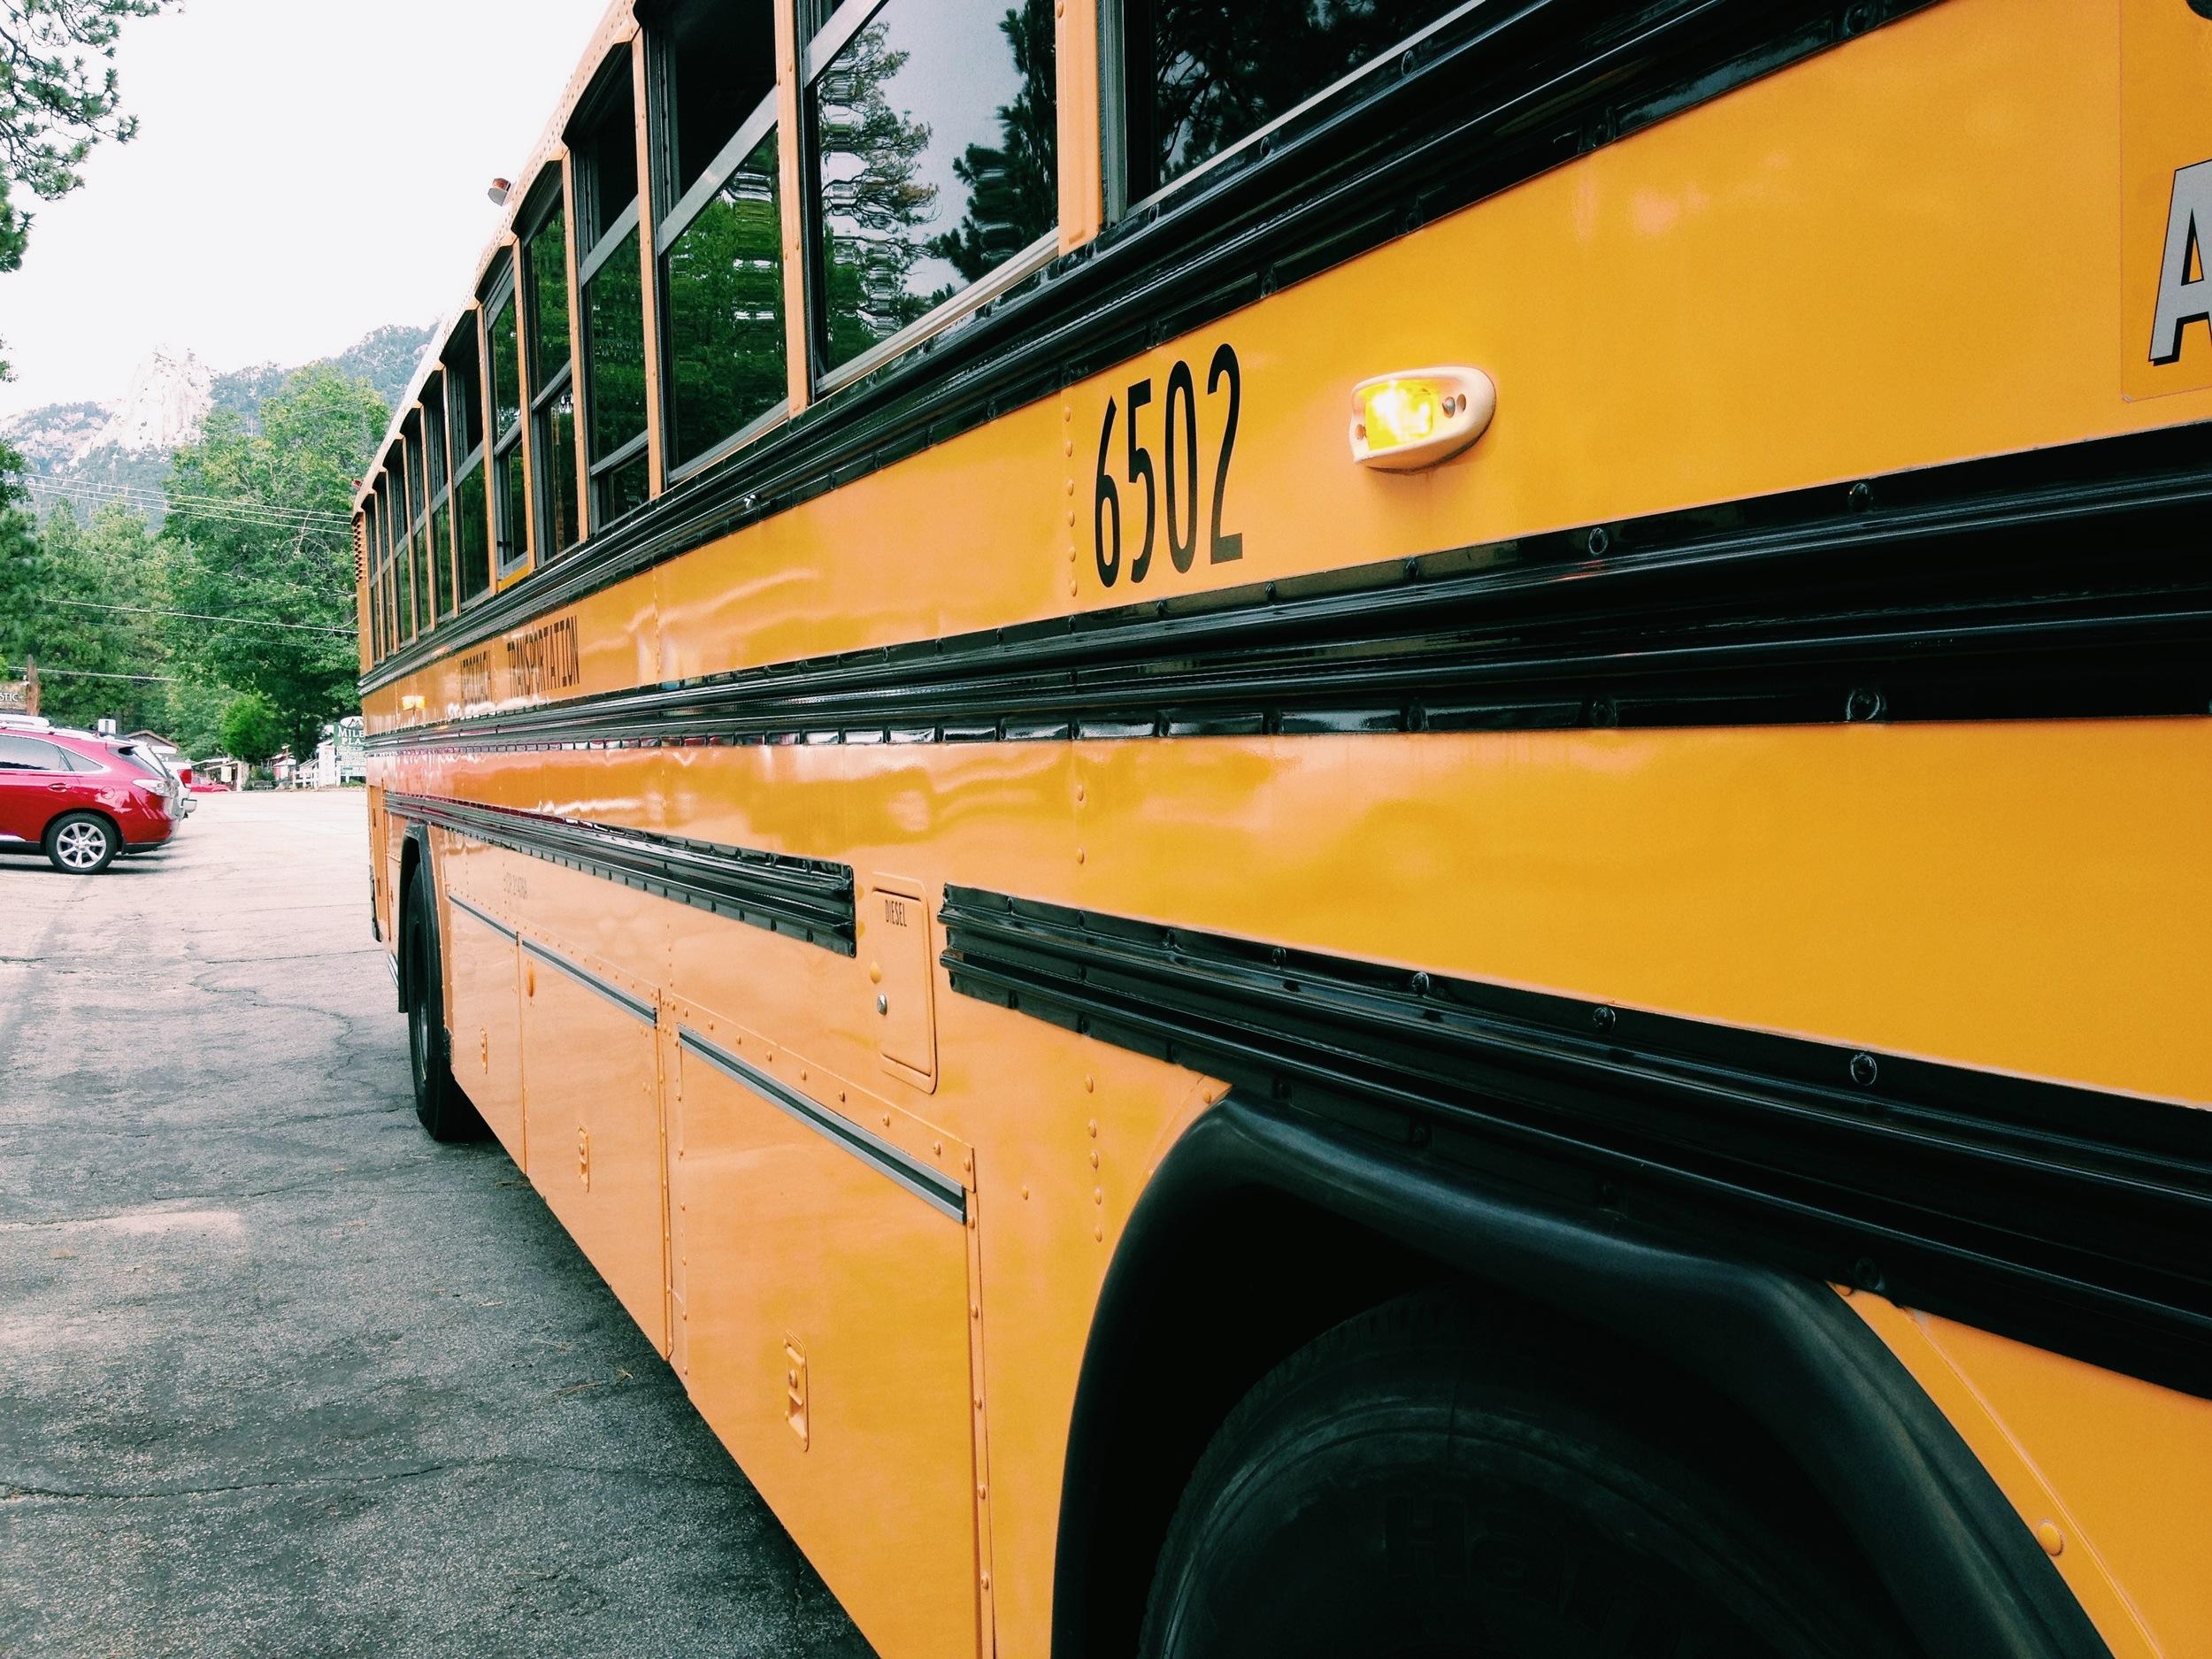 international party bus to Idyllwild!